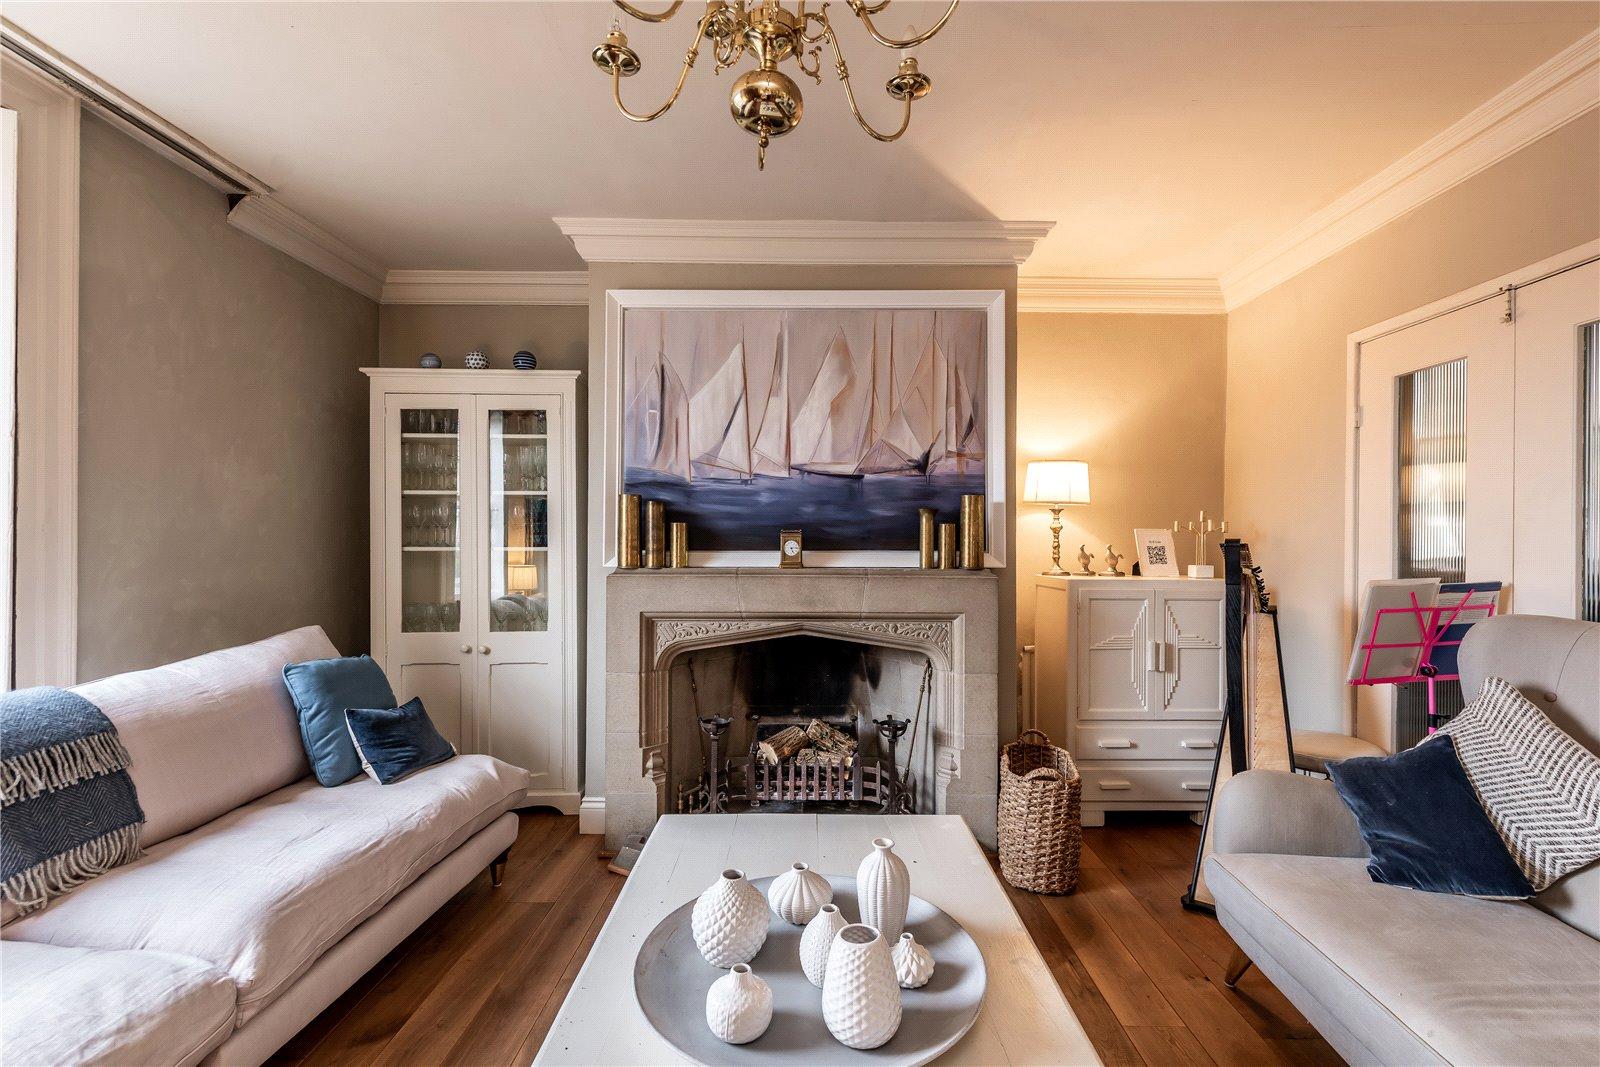 symmetrical neutral and blue Georgian home interior with Tudor fireplace